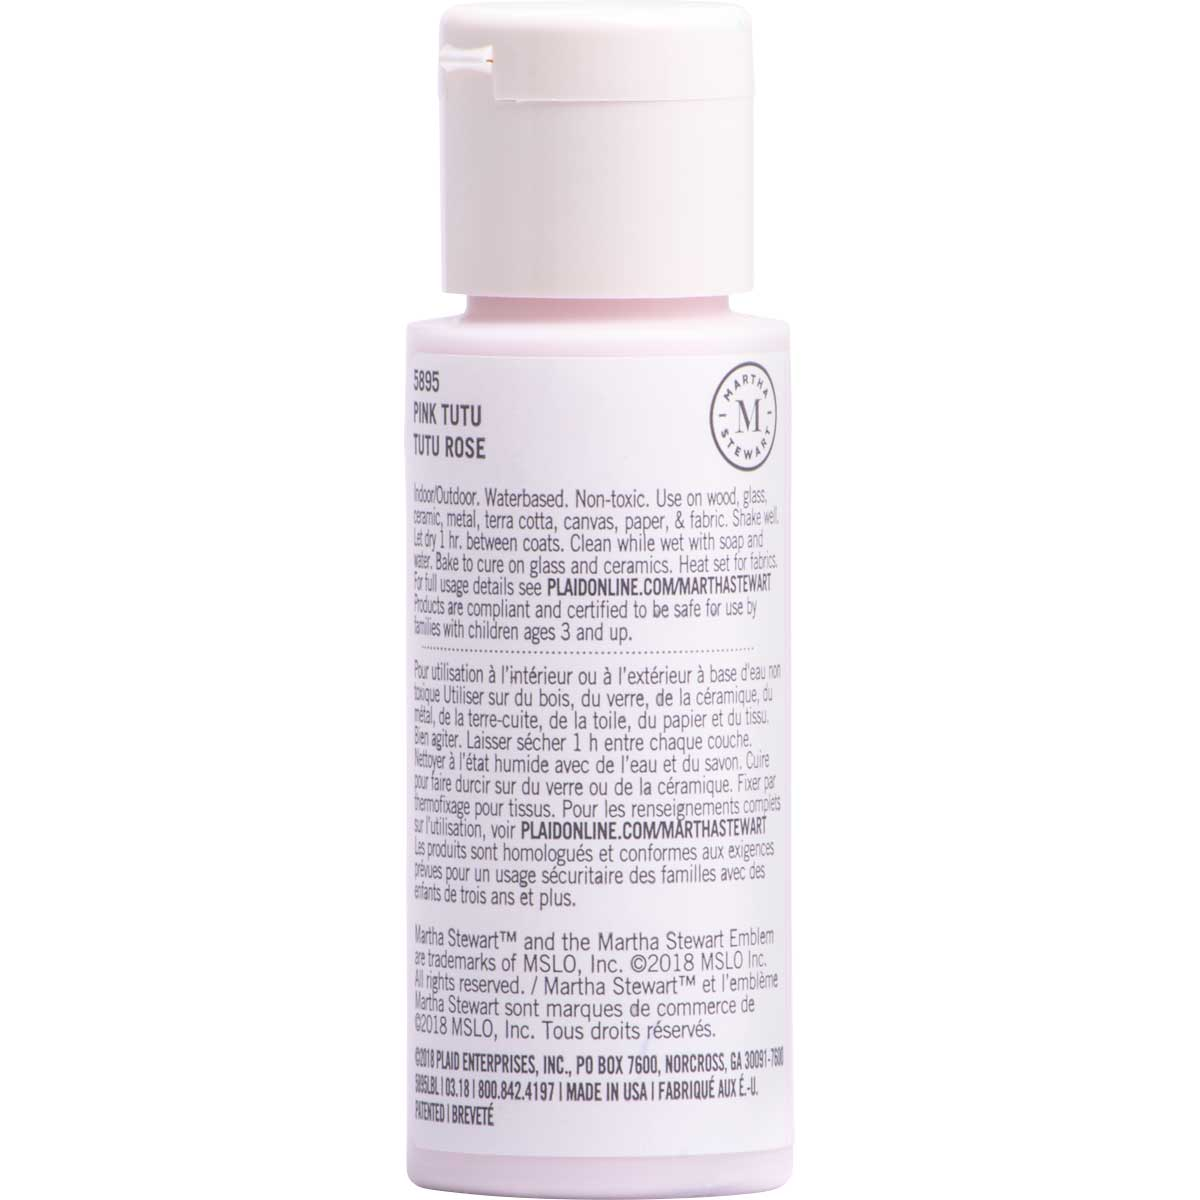 Martha Stewart ® Multi-Surface Satin Acrylic Craft Paint CPSIA - Pink Tutu, 2 oz. - 5895